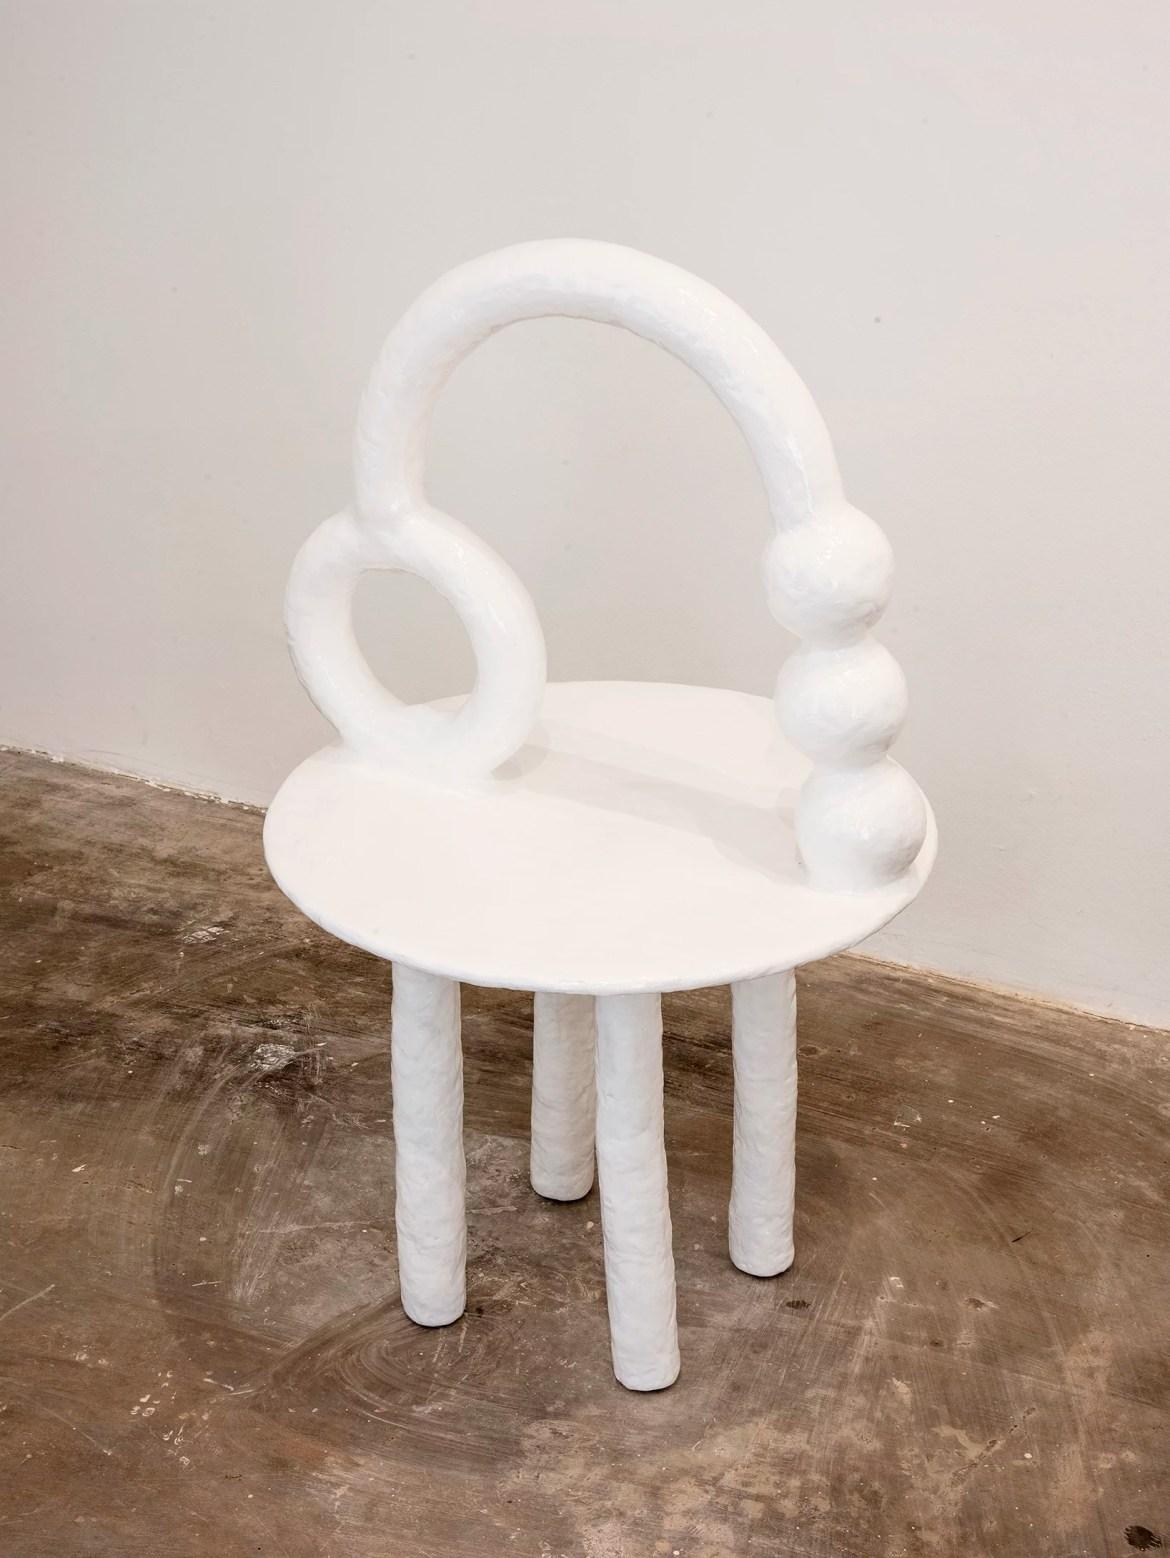 An organic white design chair designed by Brazilian artist Camilla D'Anunziata.